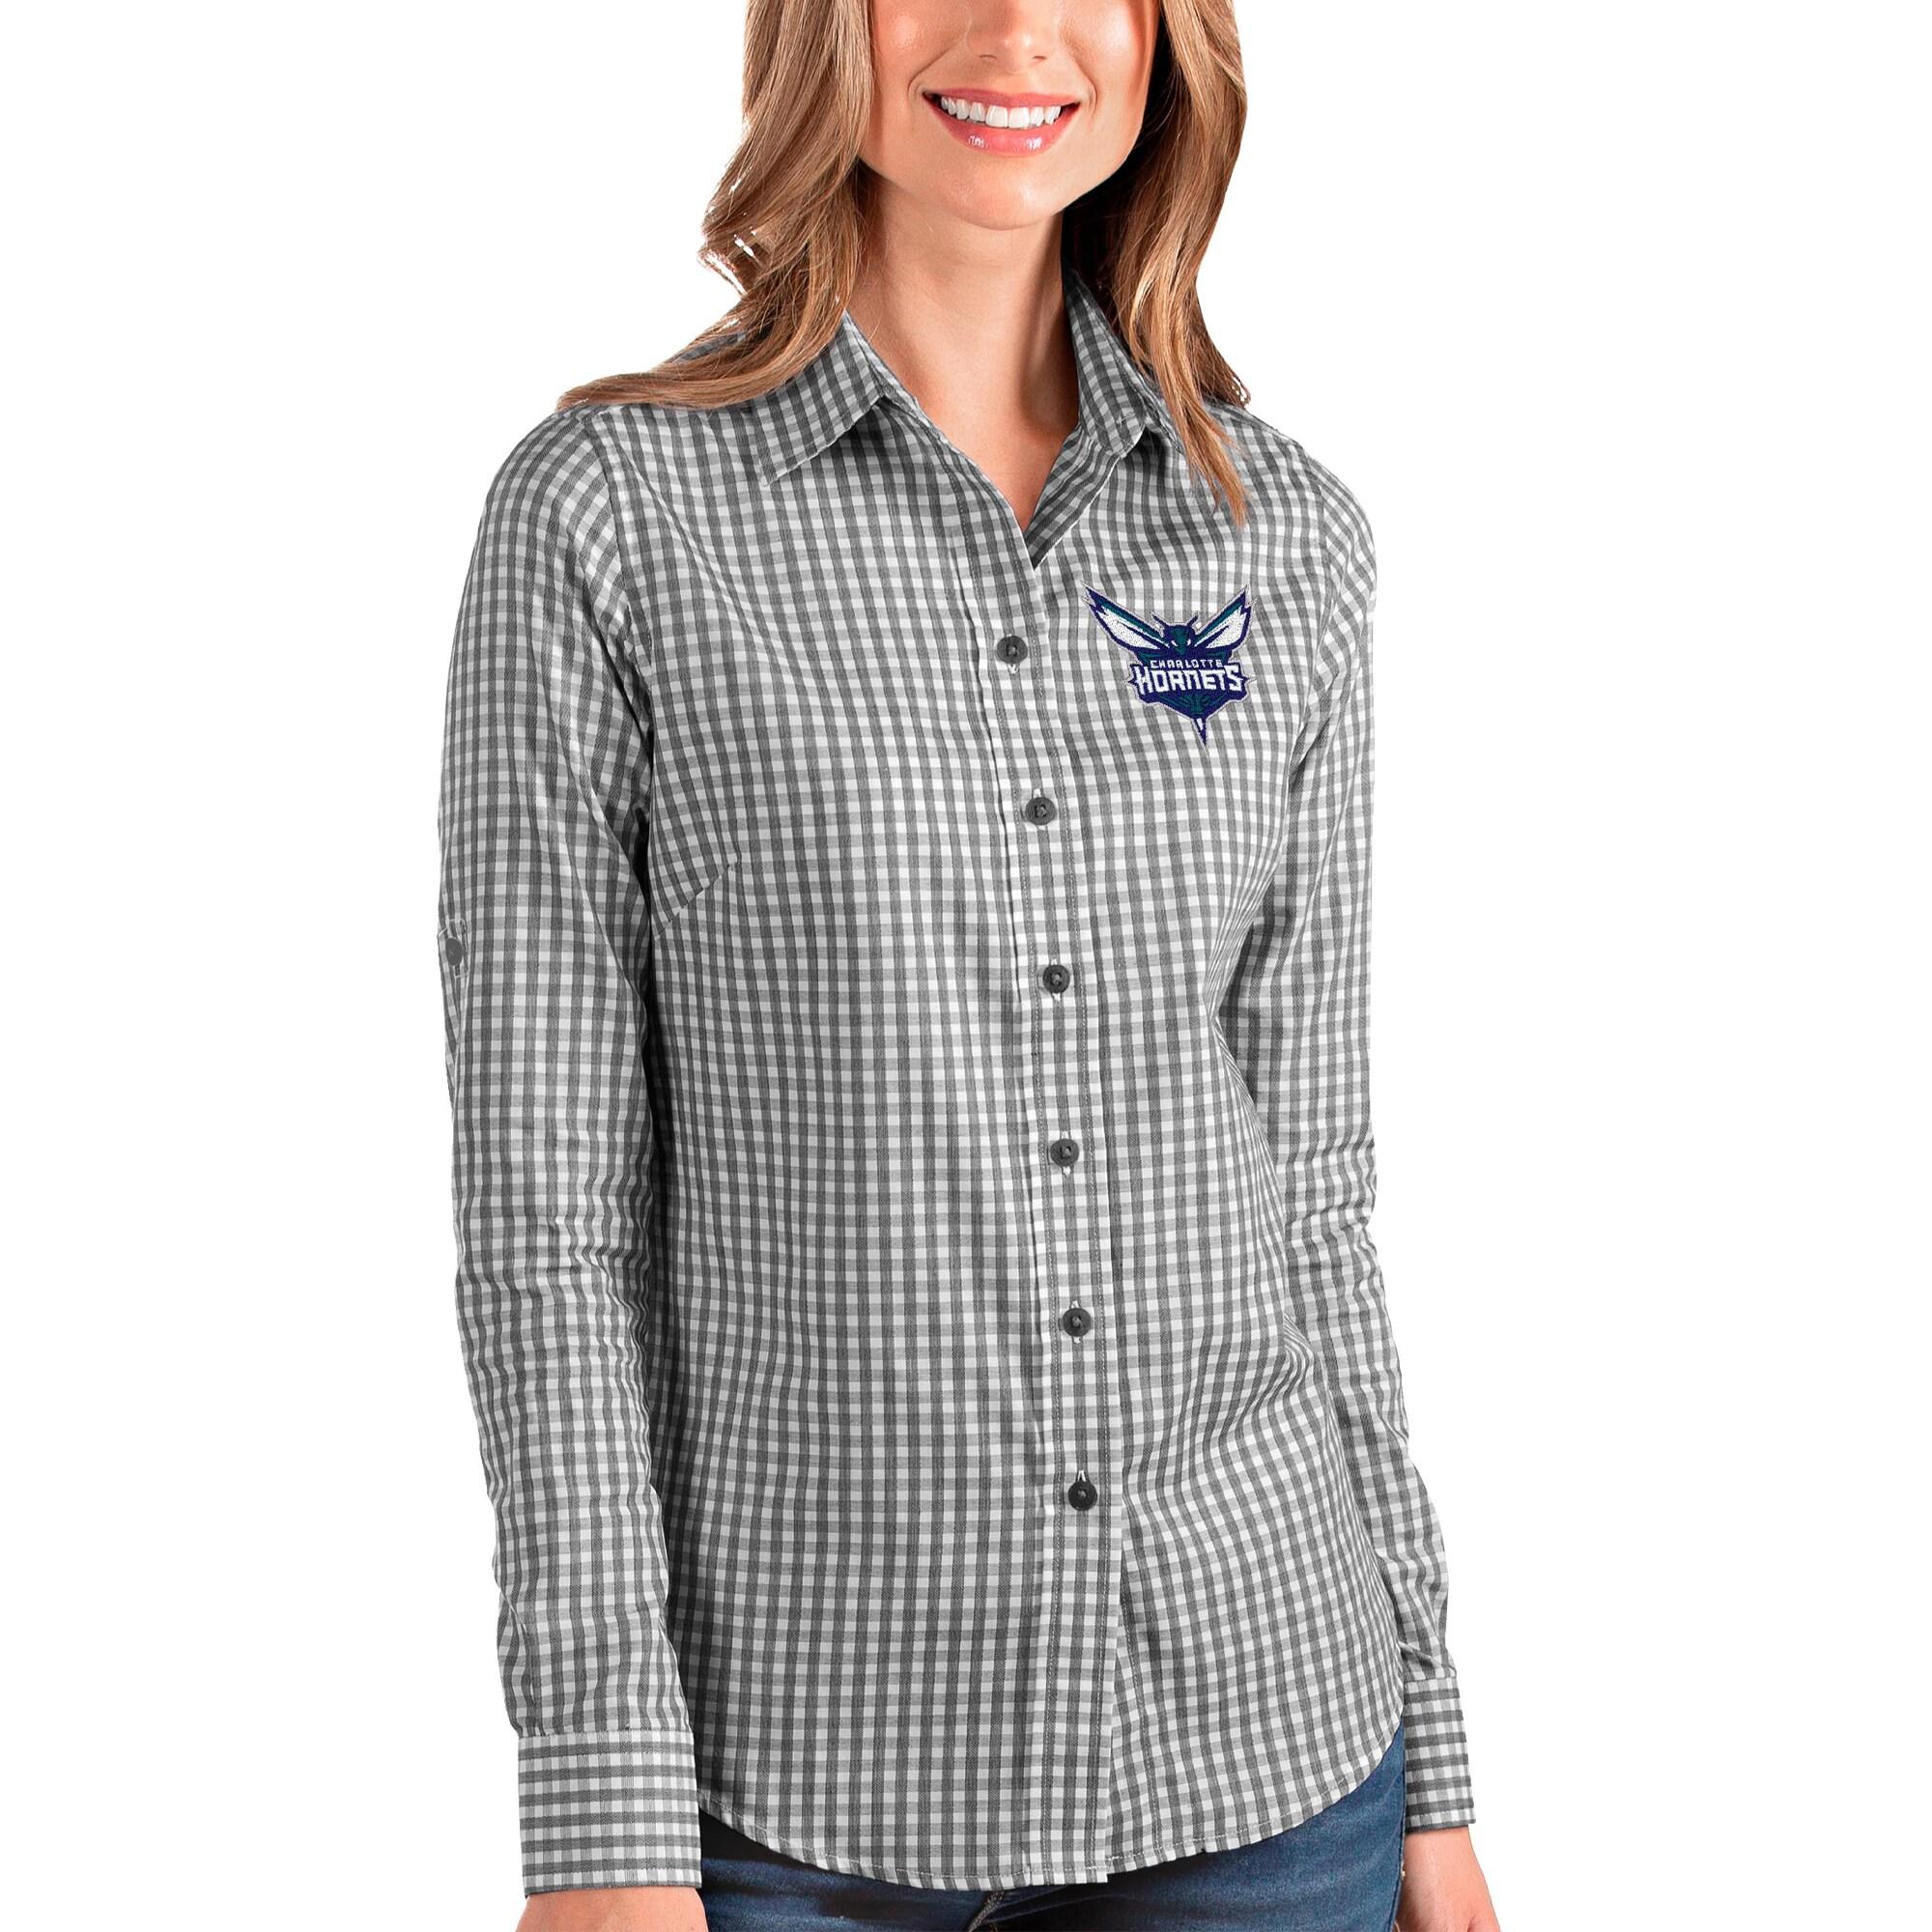 Charlotte Hornets Antigua Women's Structure Button-Up Long Sleeve Shirt - Black/White